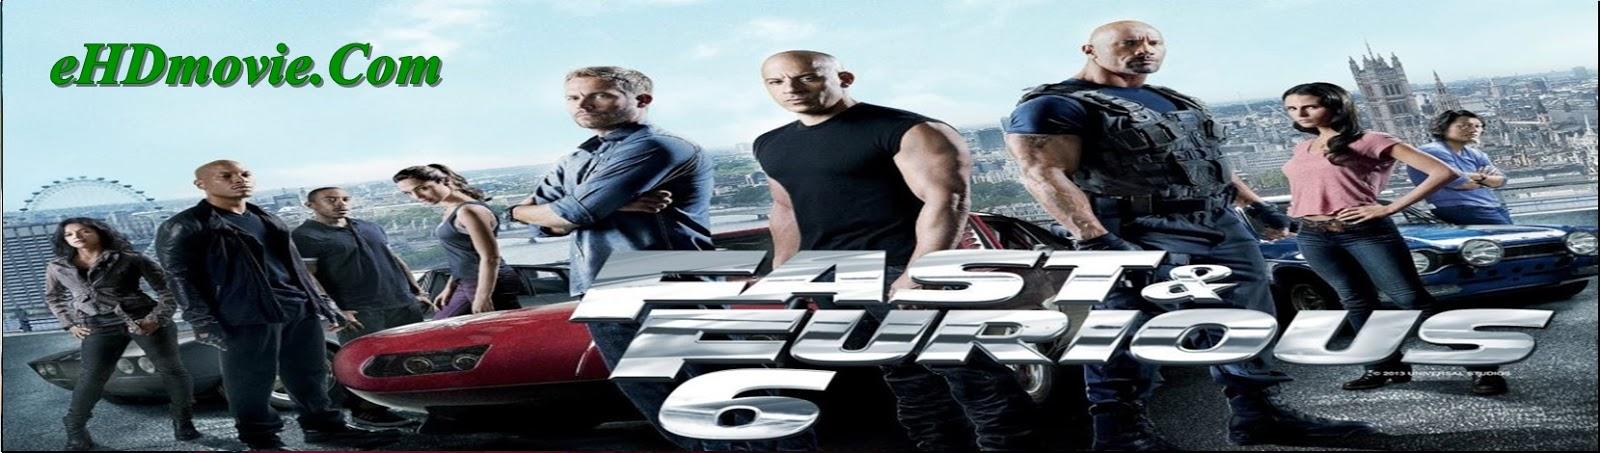 Fast & Furious 6 2013 Full Movie Dual Audio [Hindi – English] 1080p - 720p - 480p ORG BRRip 500MB - 1GB - 6GB ESubs Free Download